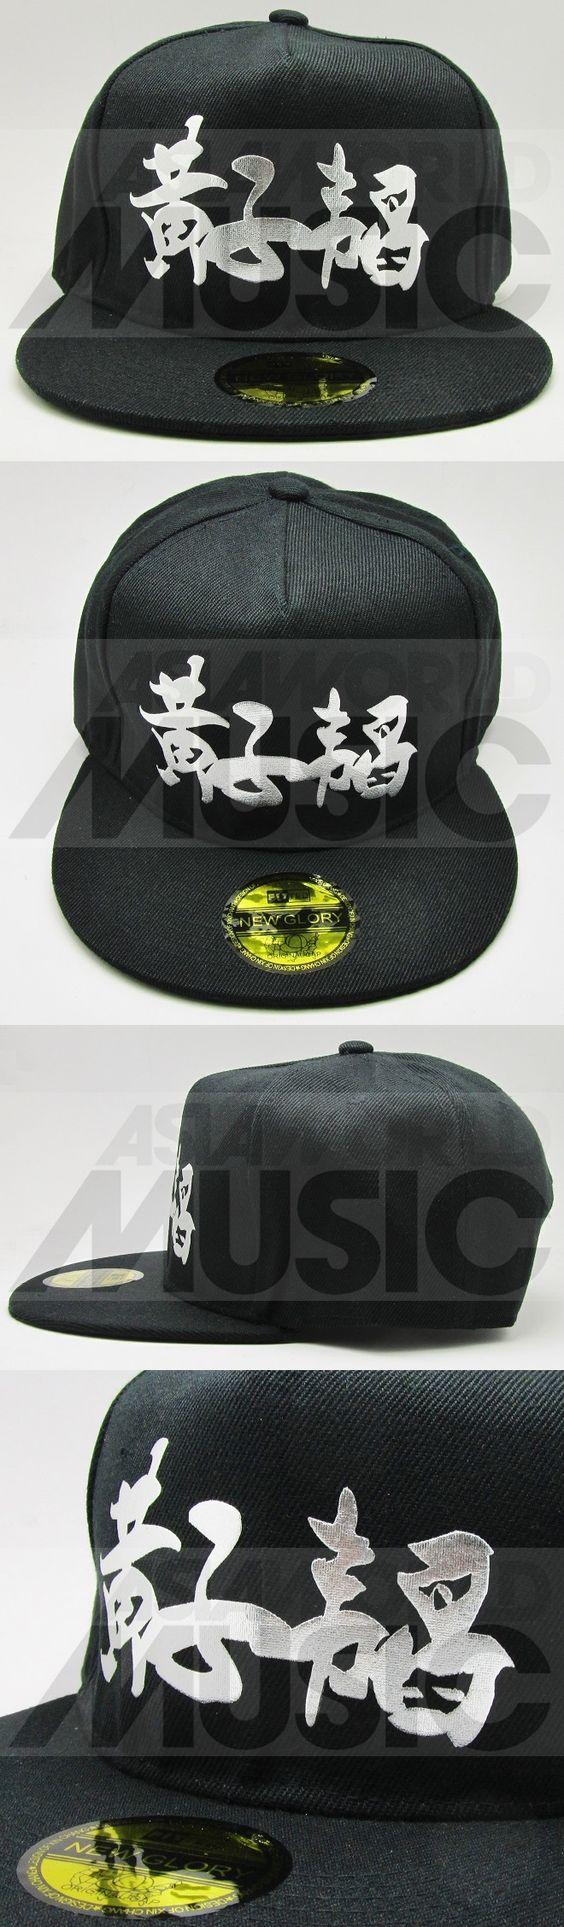 Z.TAO - Casquette HANG ZI TAO (Shiny Silver / Black) - ASIAWORLDMUSIC - Site de vente en ligne des magasins MUSICA